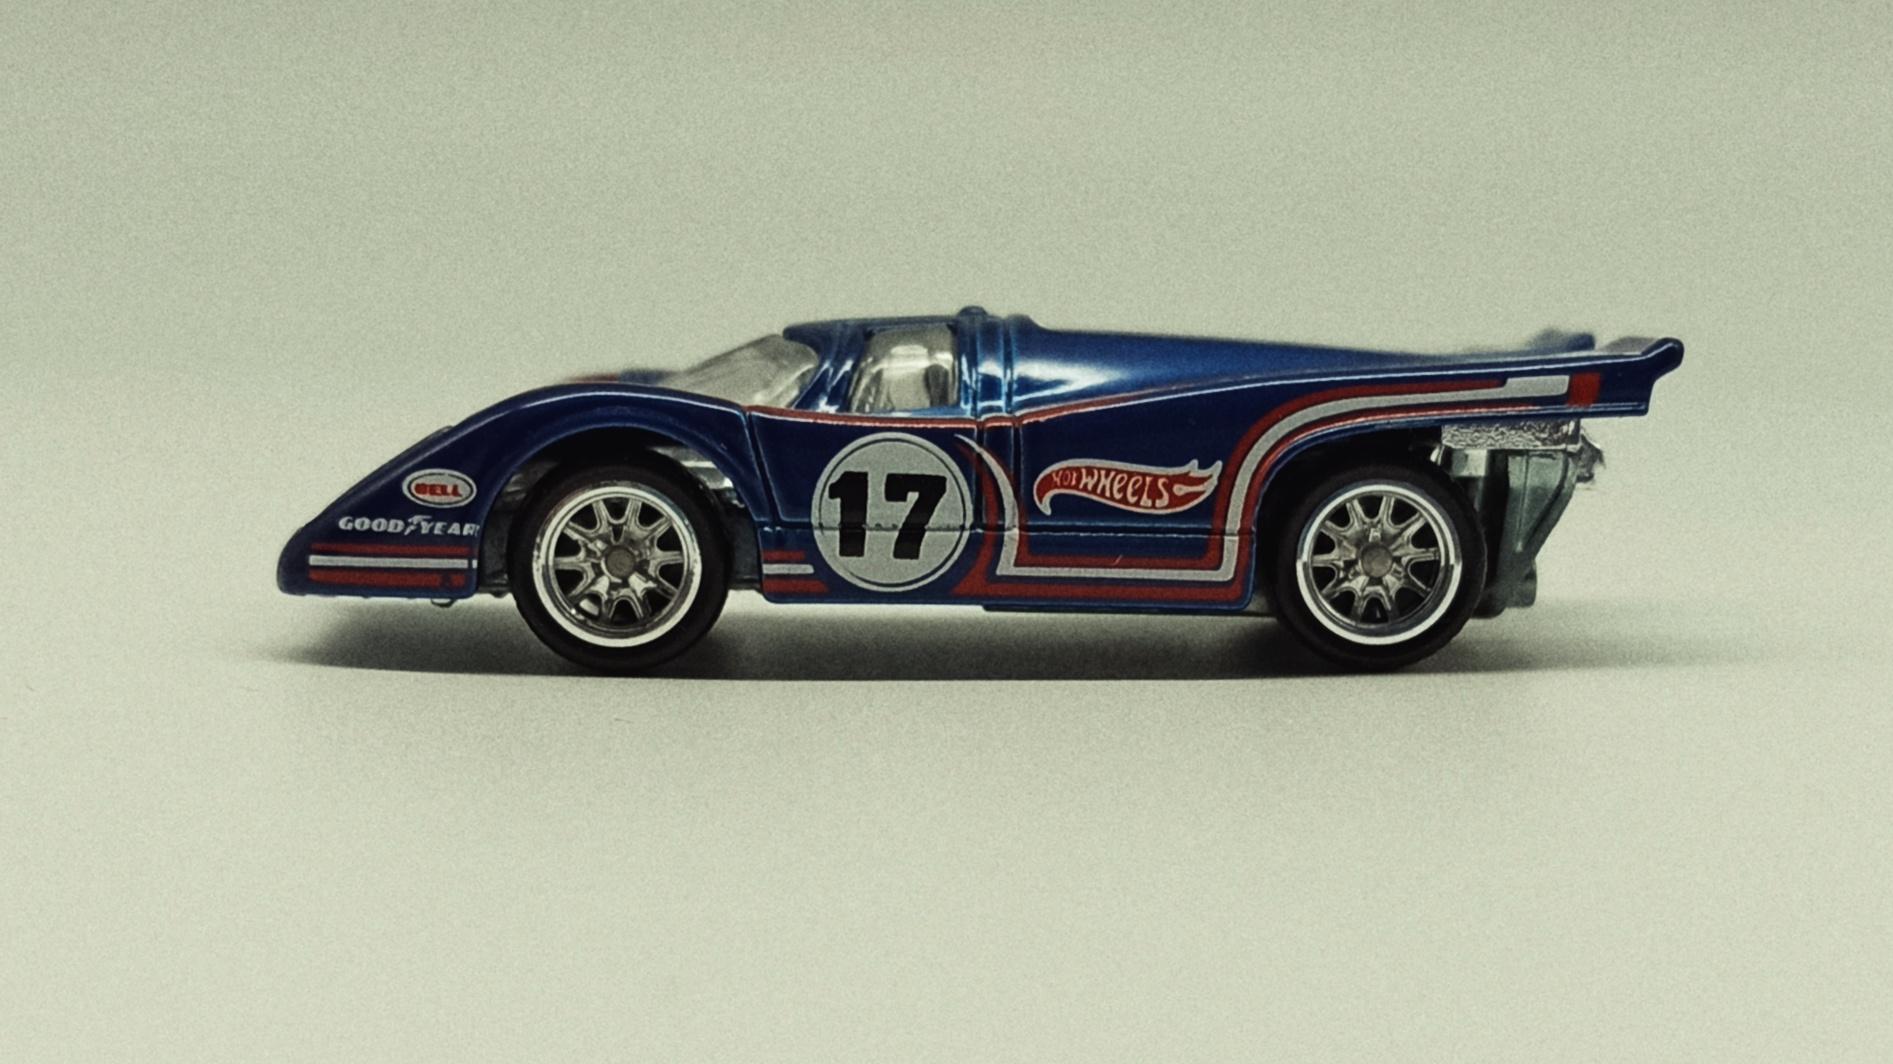 Hot Wheels Porsche 917K (Re-Tooled Version) (CFN62) 2015 Heritage (18/18) metalflake blue side